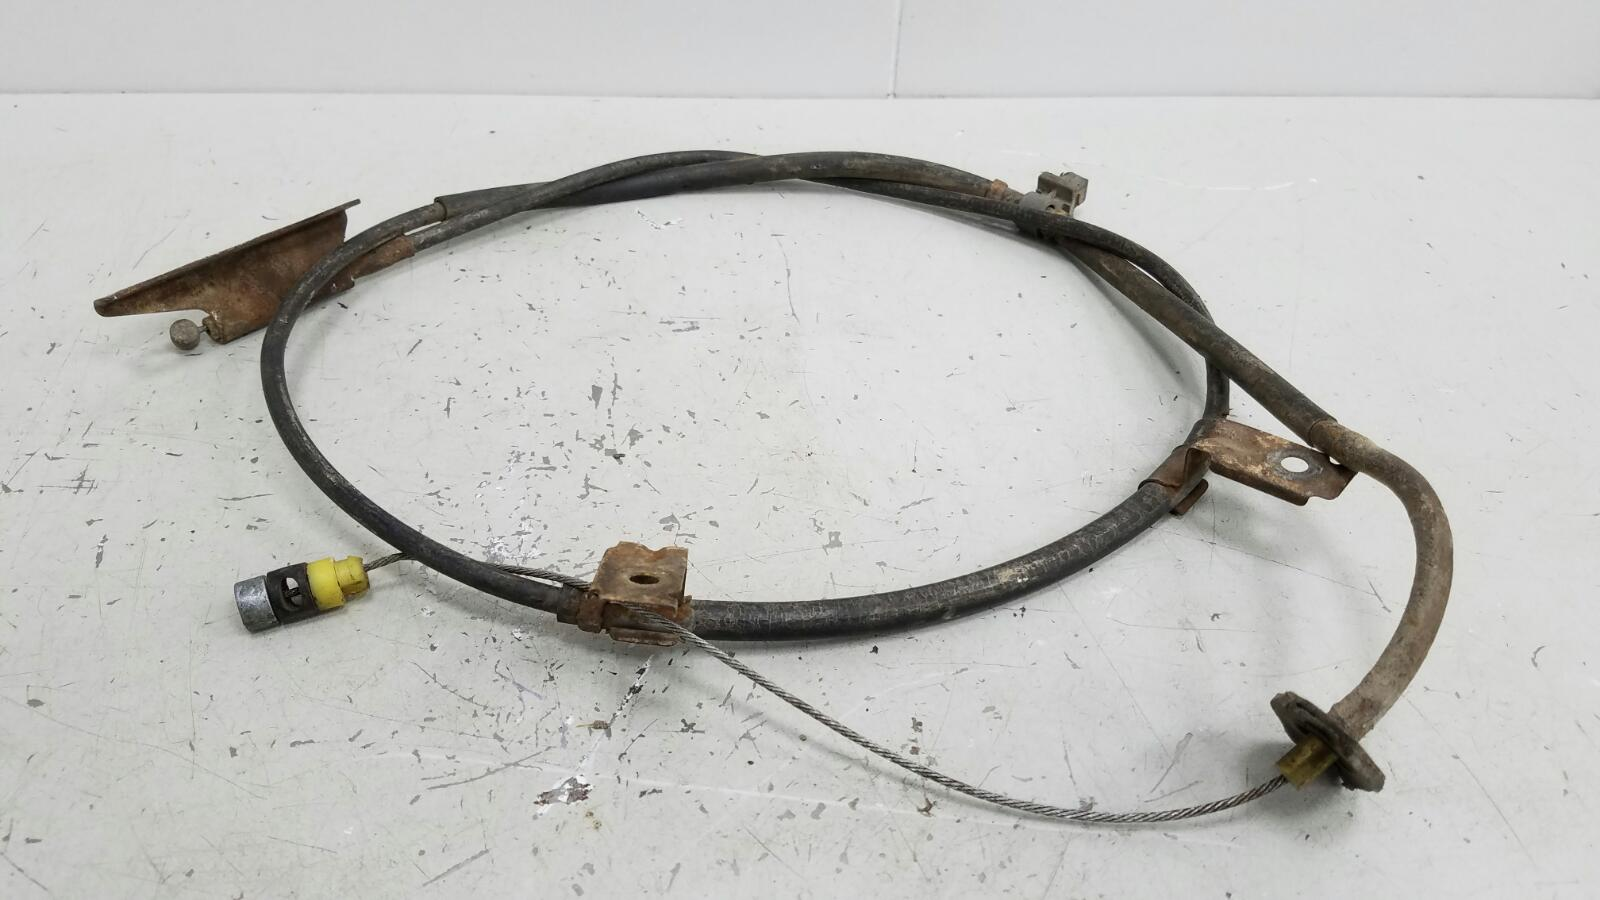 Трос ручного стояночного тормоза ручника Proton Persona 400 415 4G15 1999